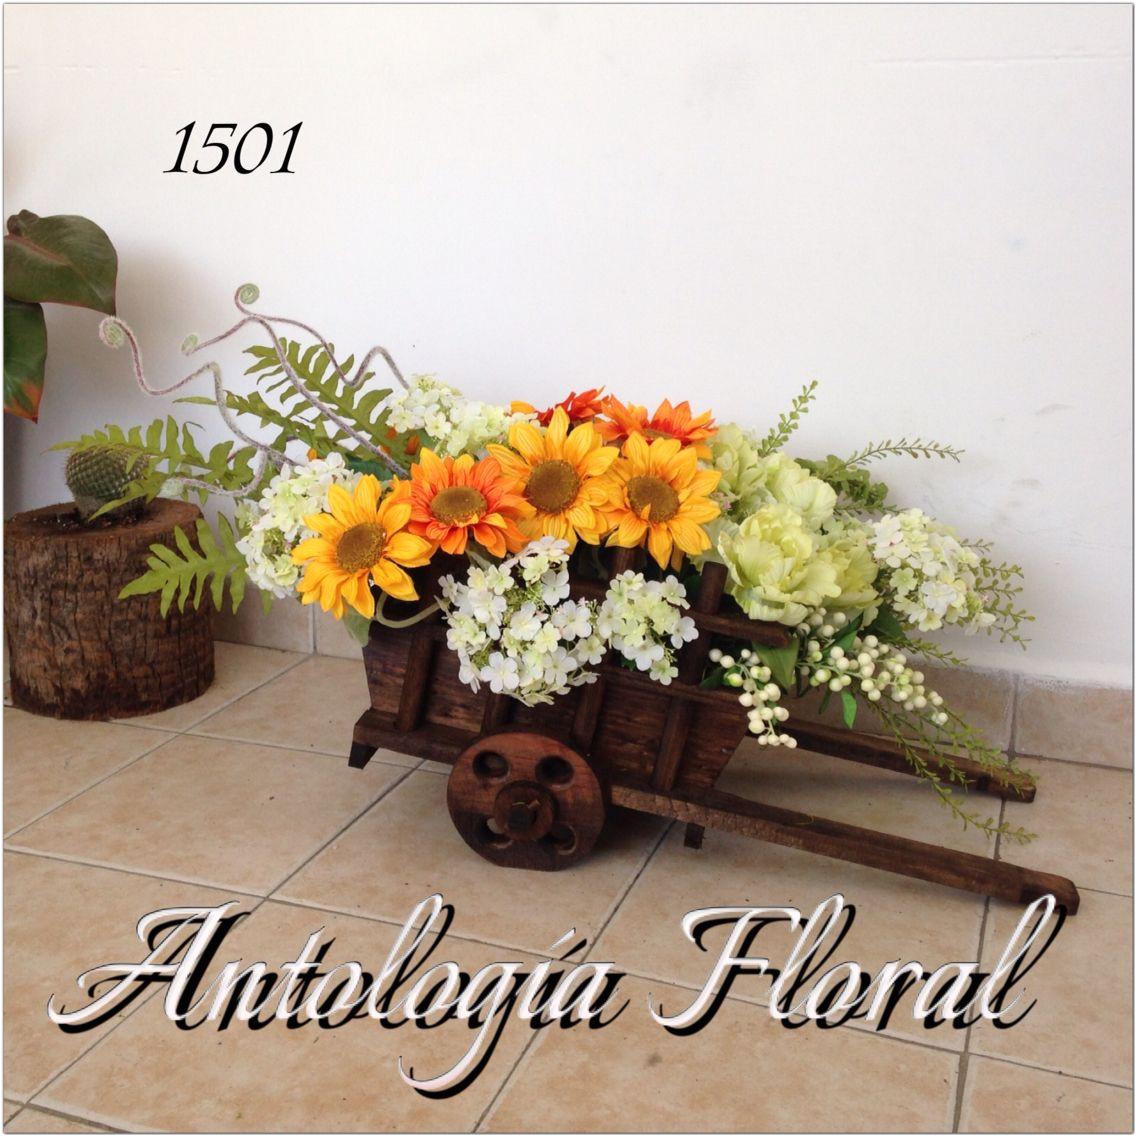 Centros De Mesa Con Flores Artificiales Arreglo De Flores Artificiales En Carreta De Madera Fitness